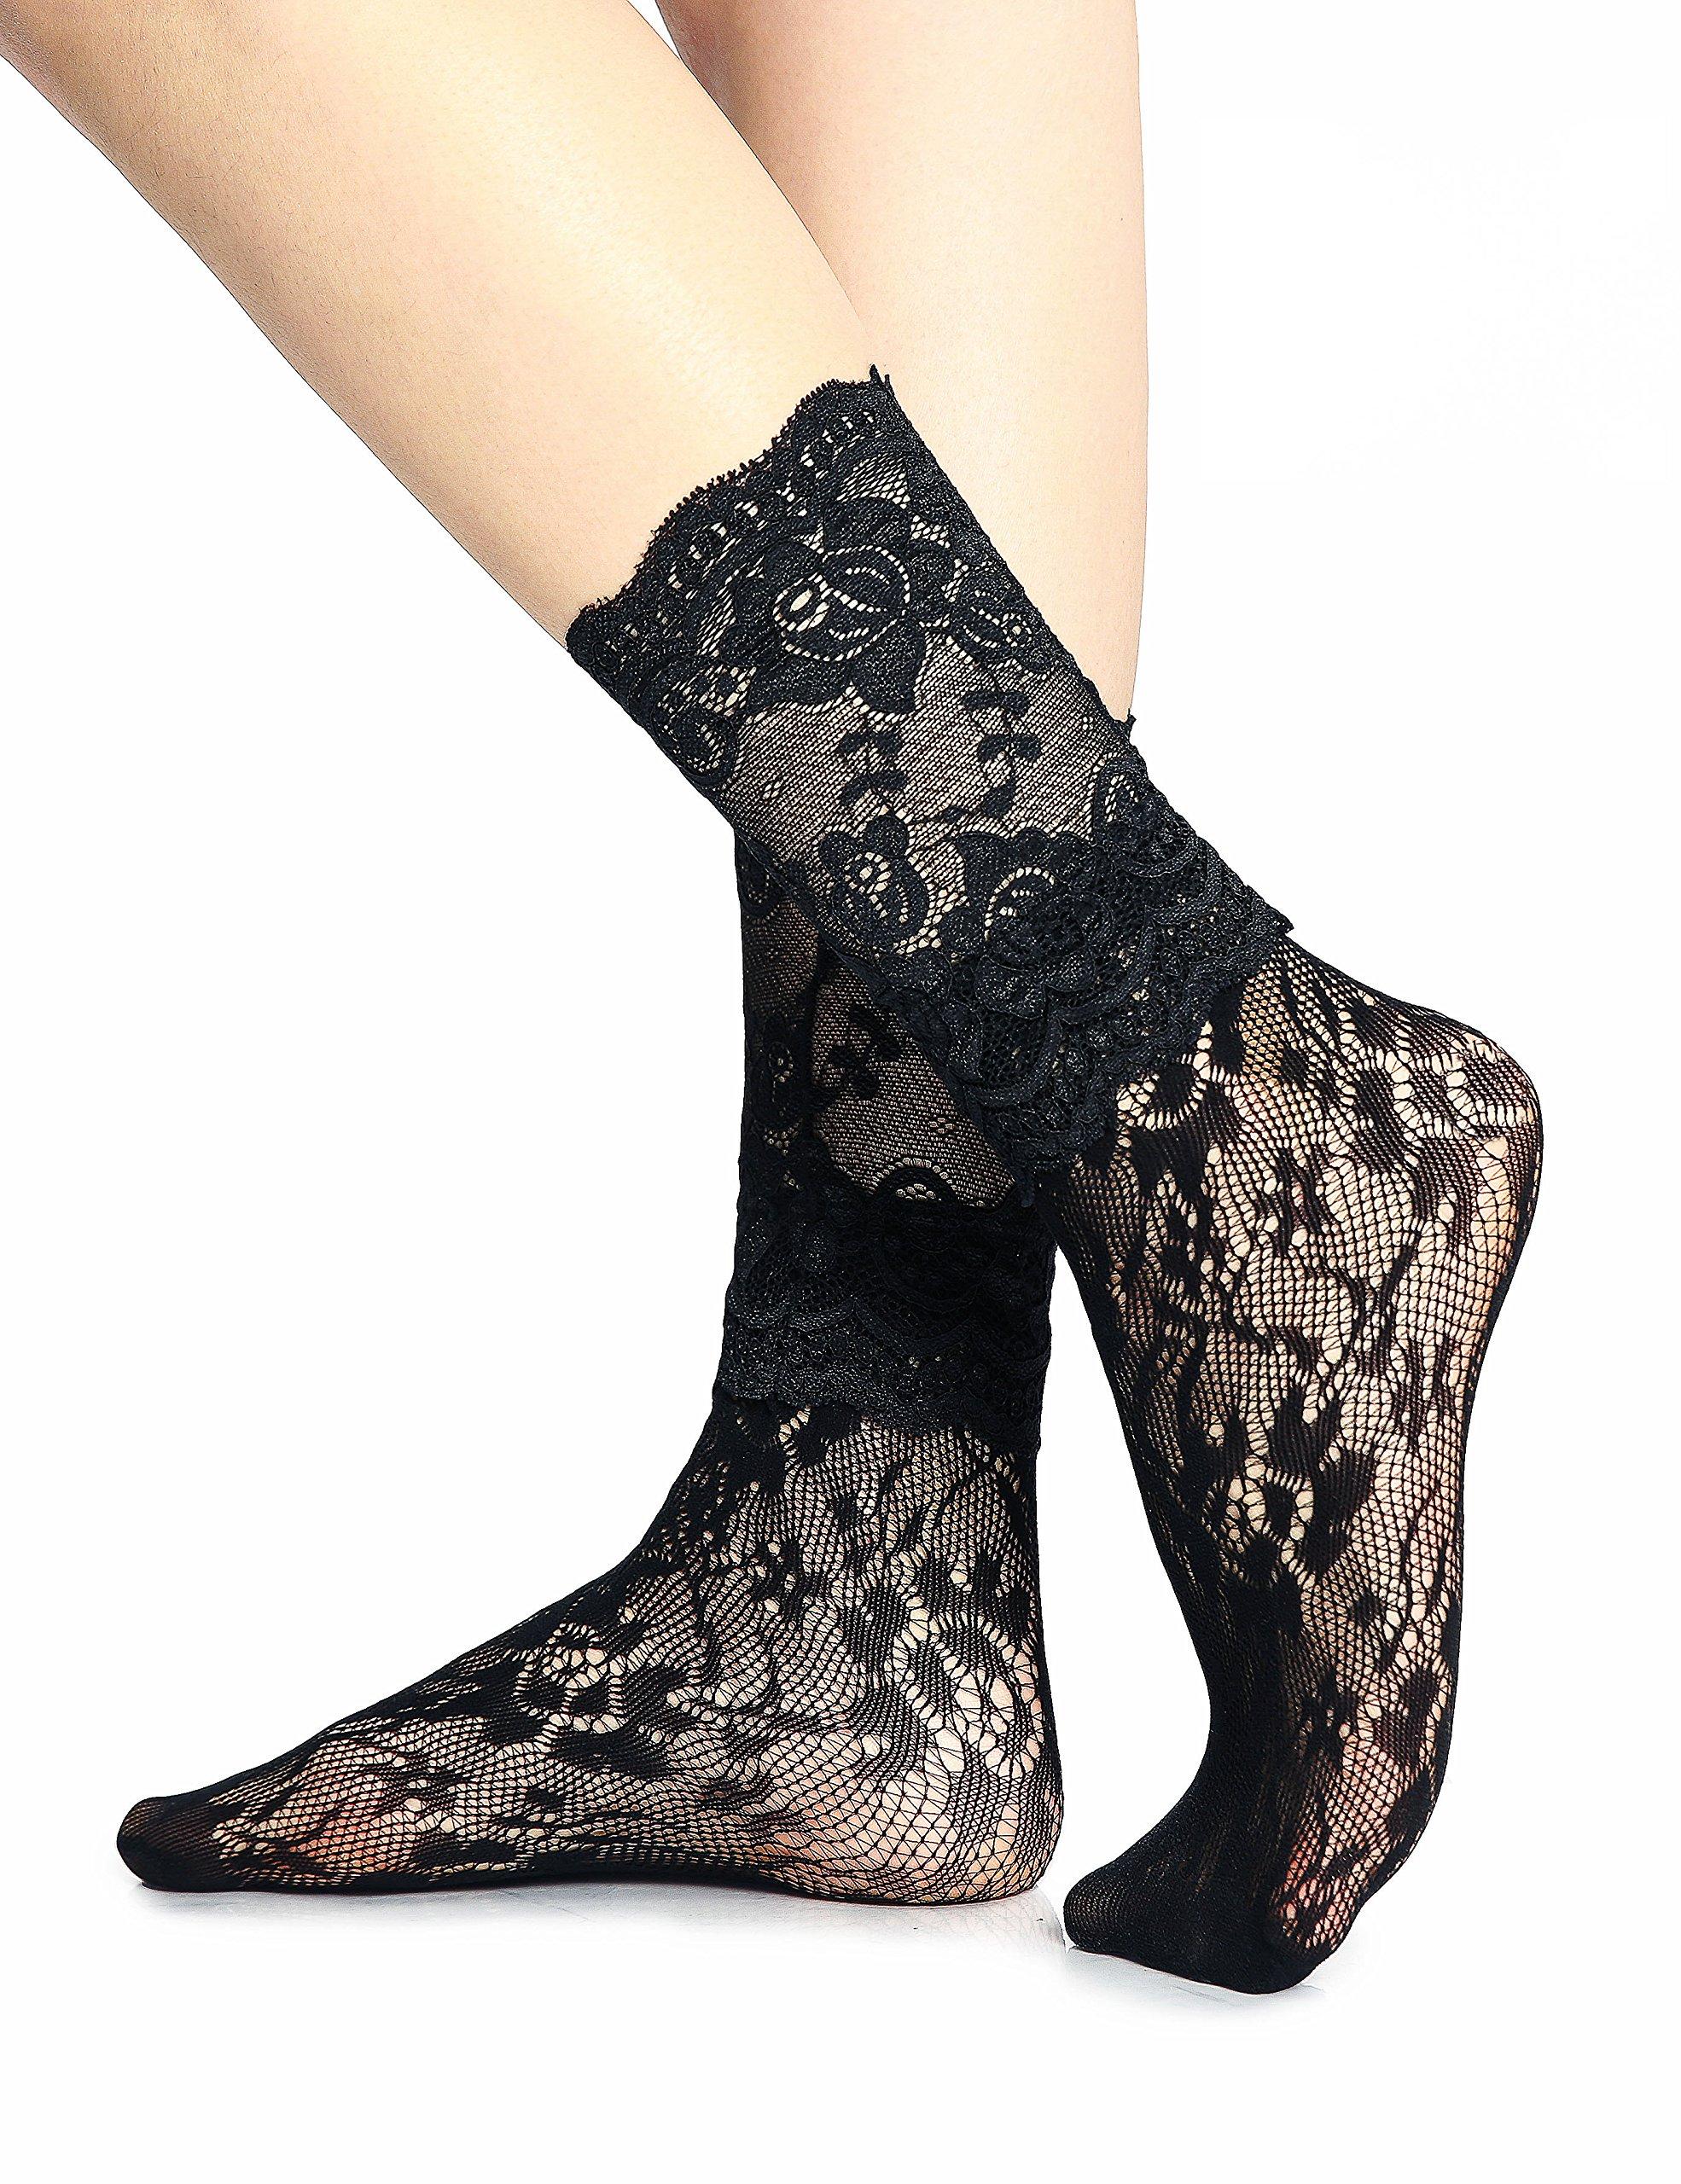 Women Black Lace Nylon Dress Socks, Cute Stylish Fishnet, Mid Calf Ankle High